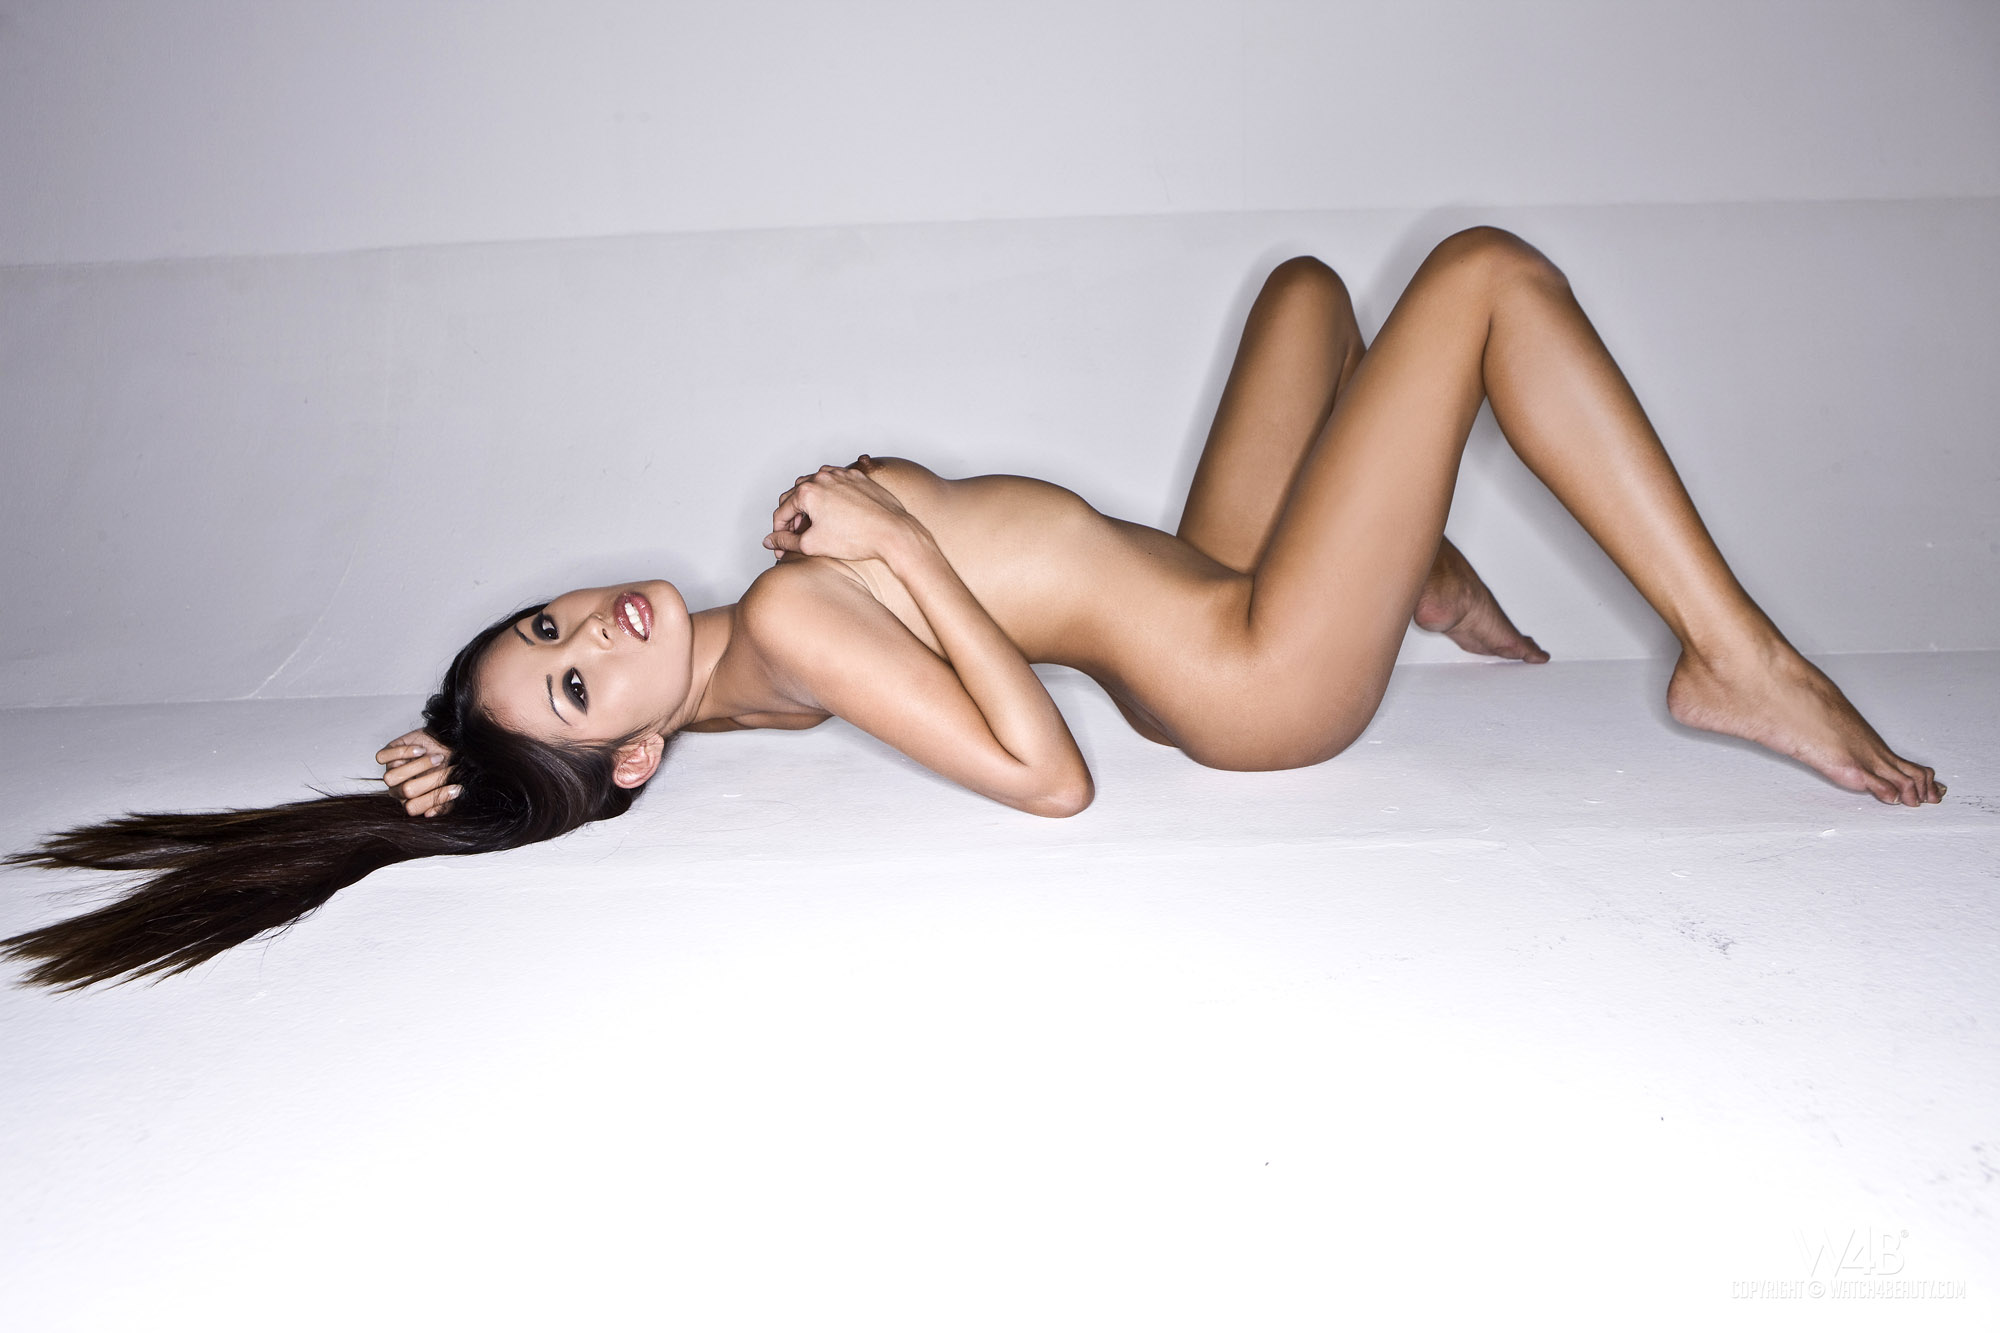 Kim kardashian naked photoshoot